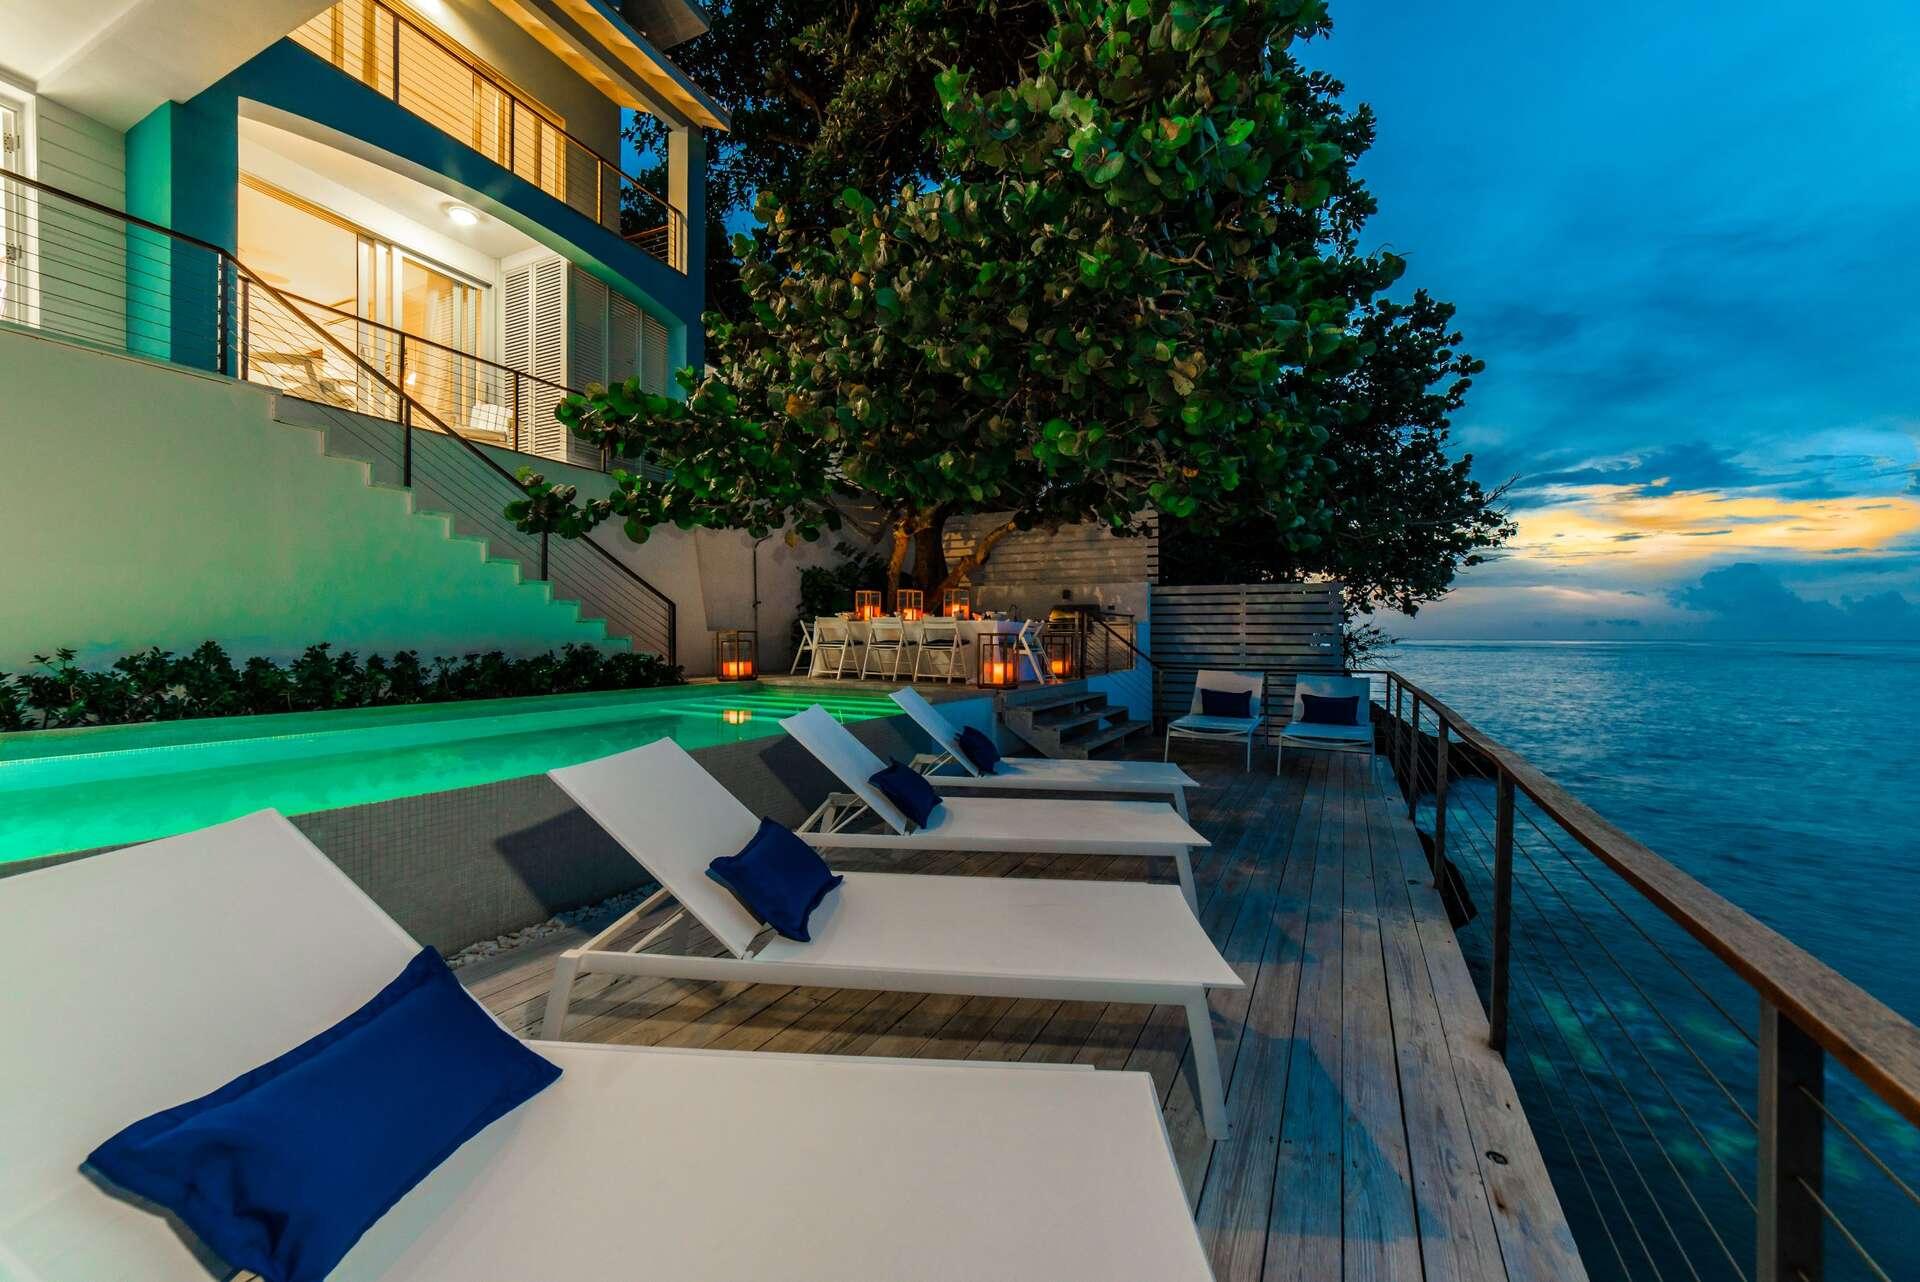 Luxury villa rentals caribbean - Jamaica - Boscobel - Rocksteady Villa - Image 1/18